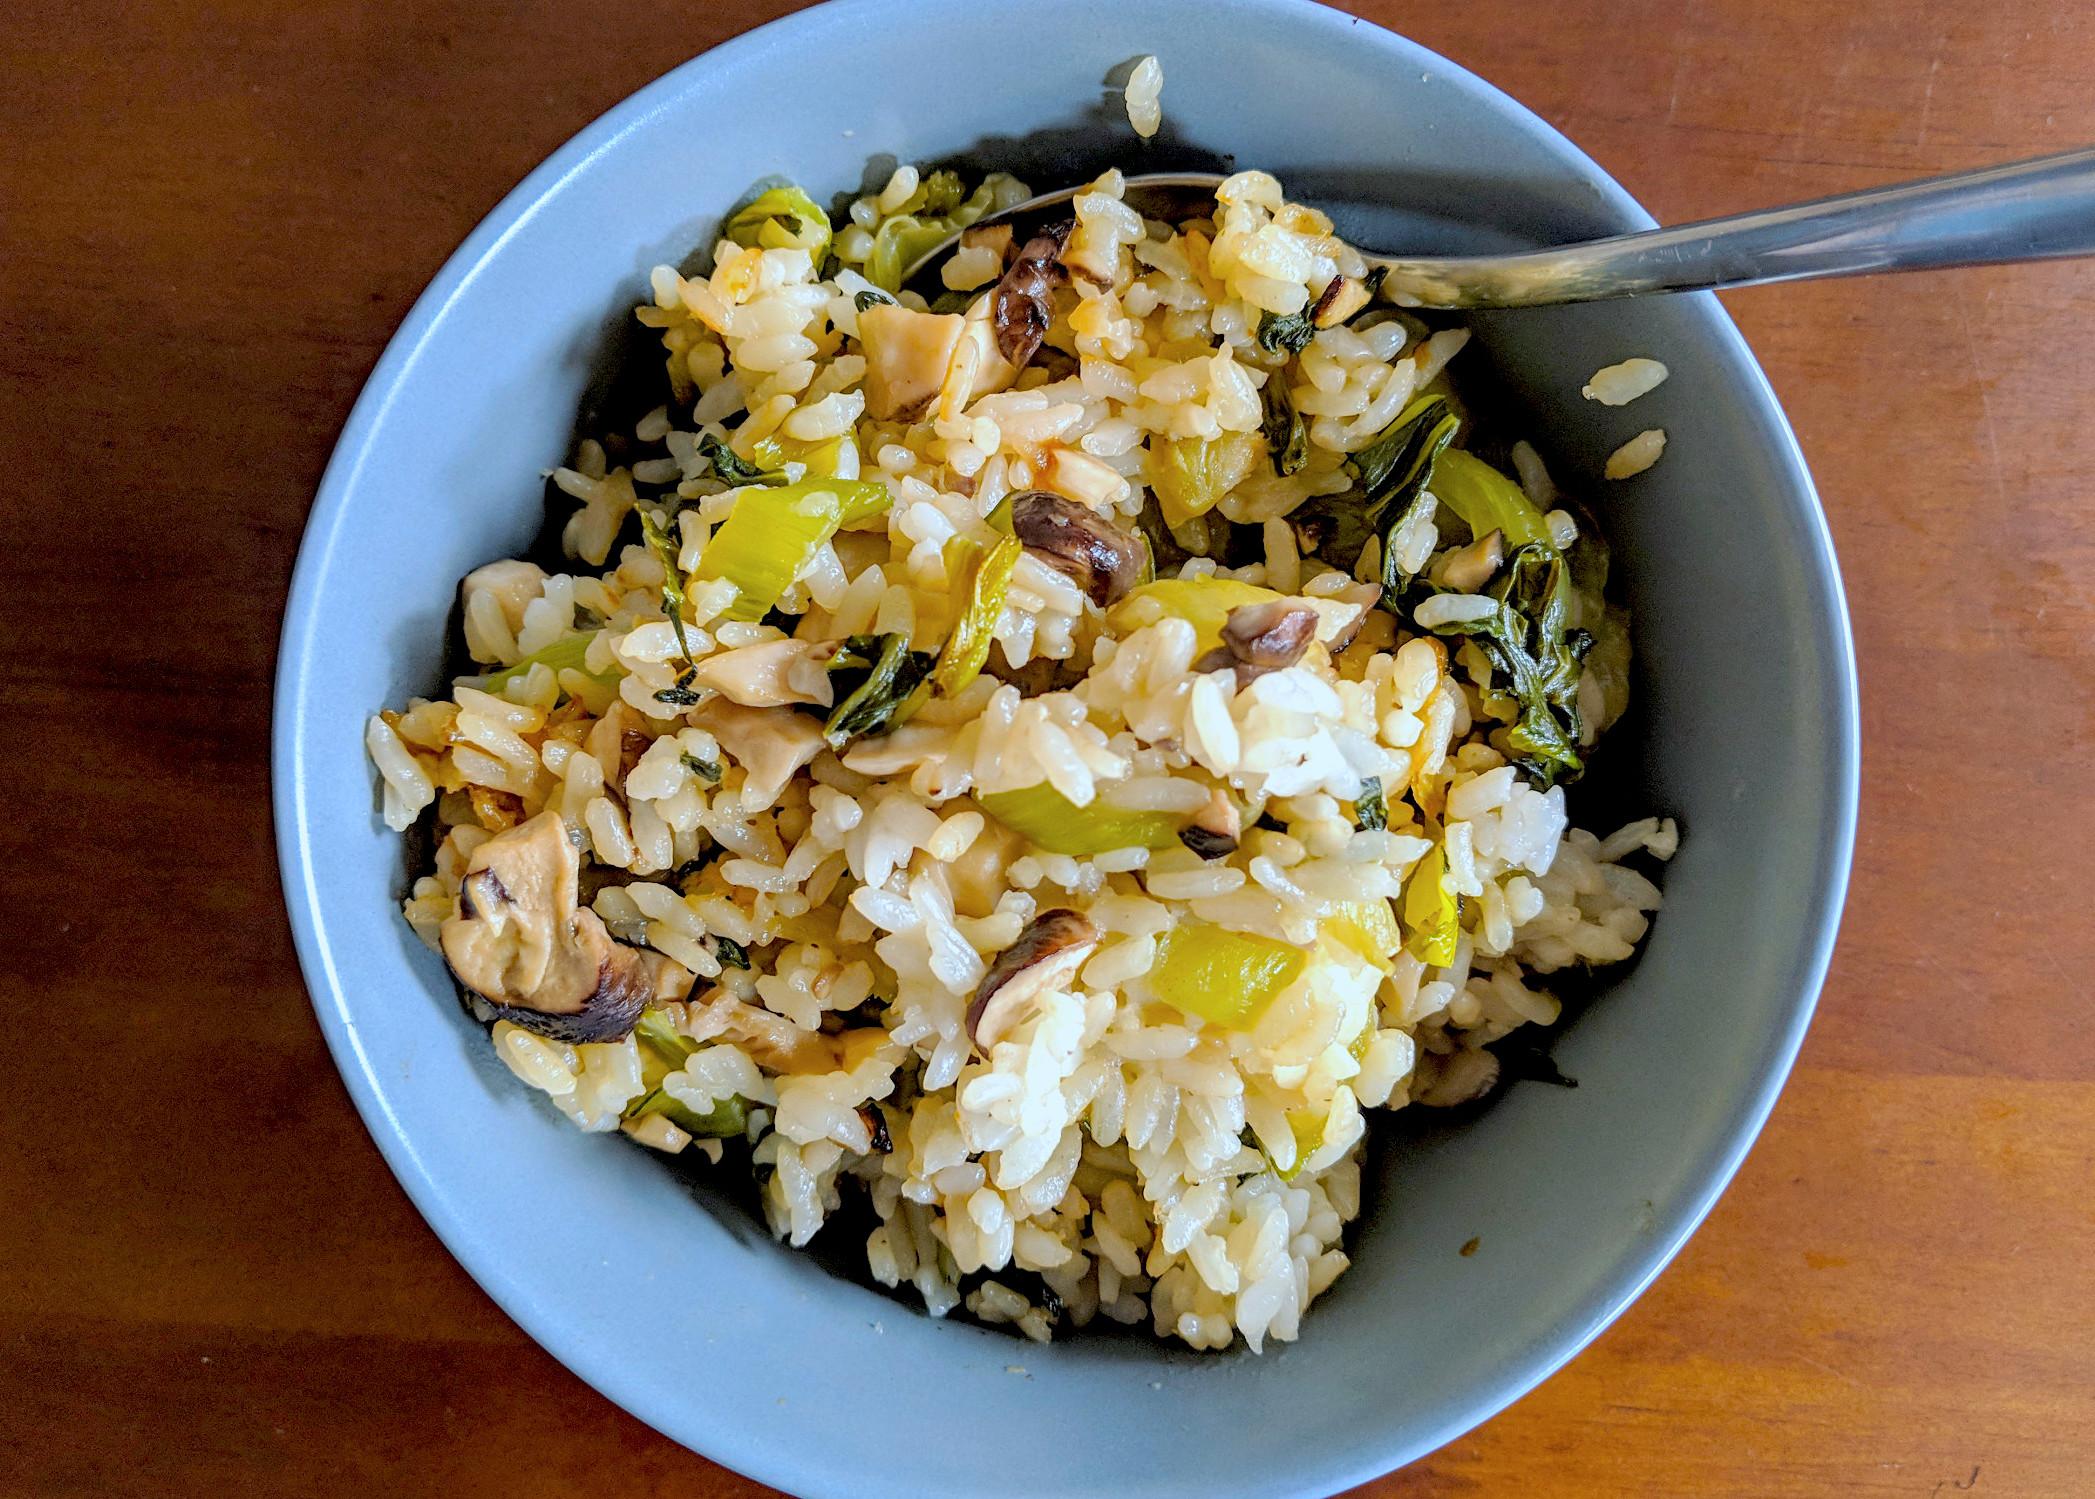 shanghainese-veggie-rice-1.jpg